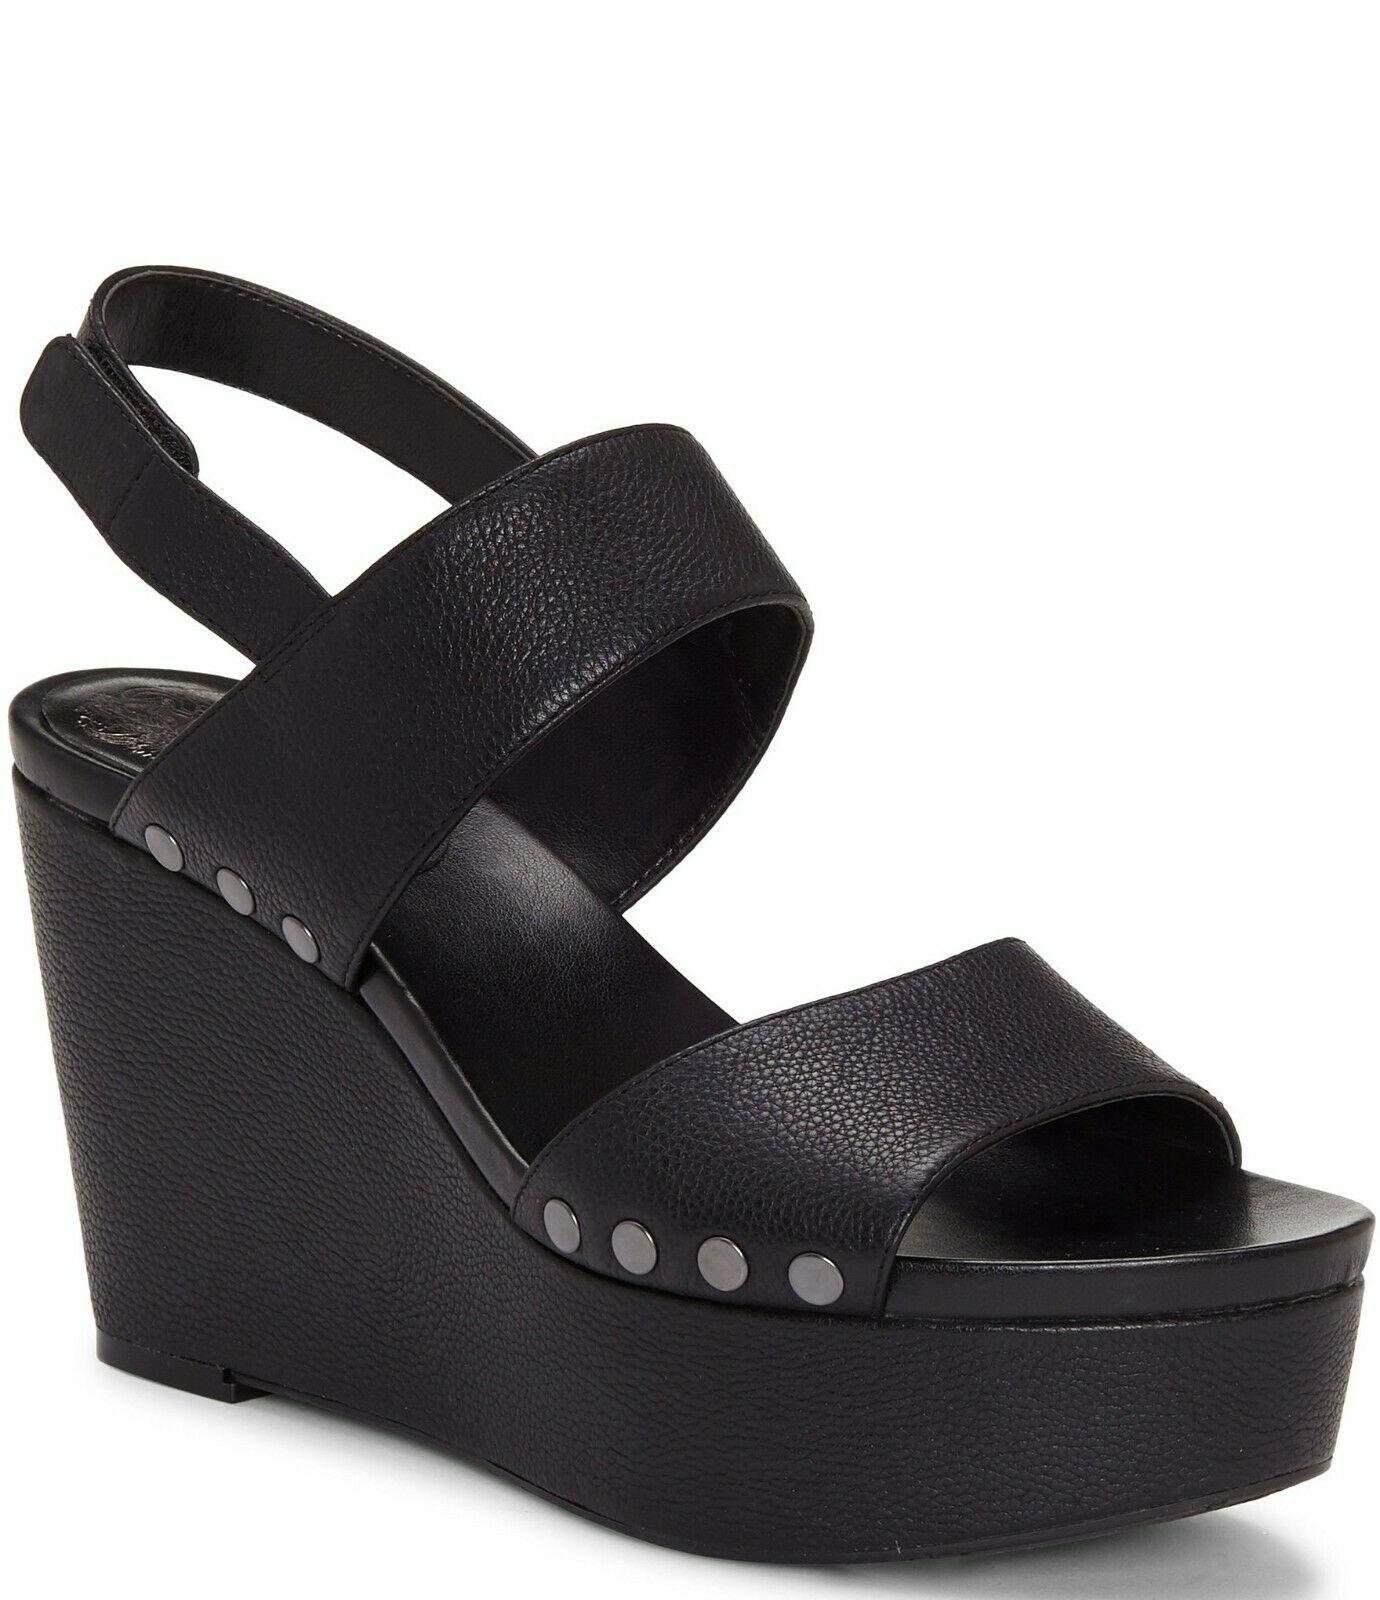 Vince Camuto Ventinda 2 Piece Leather Platform Wedge Sandals, Multip Sizes Black - $109.95